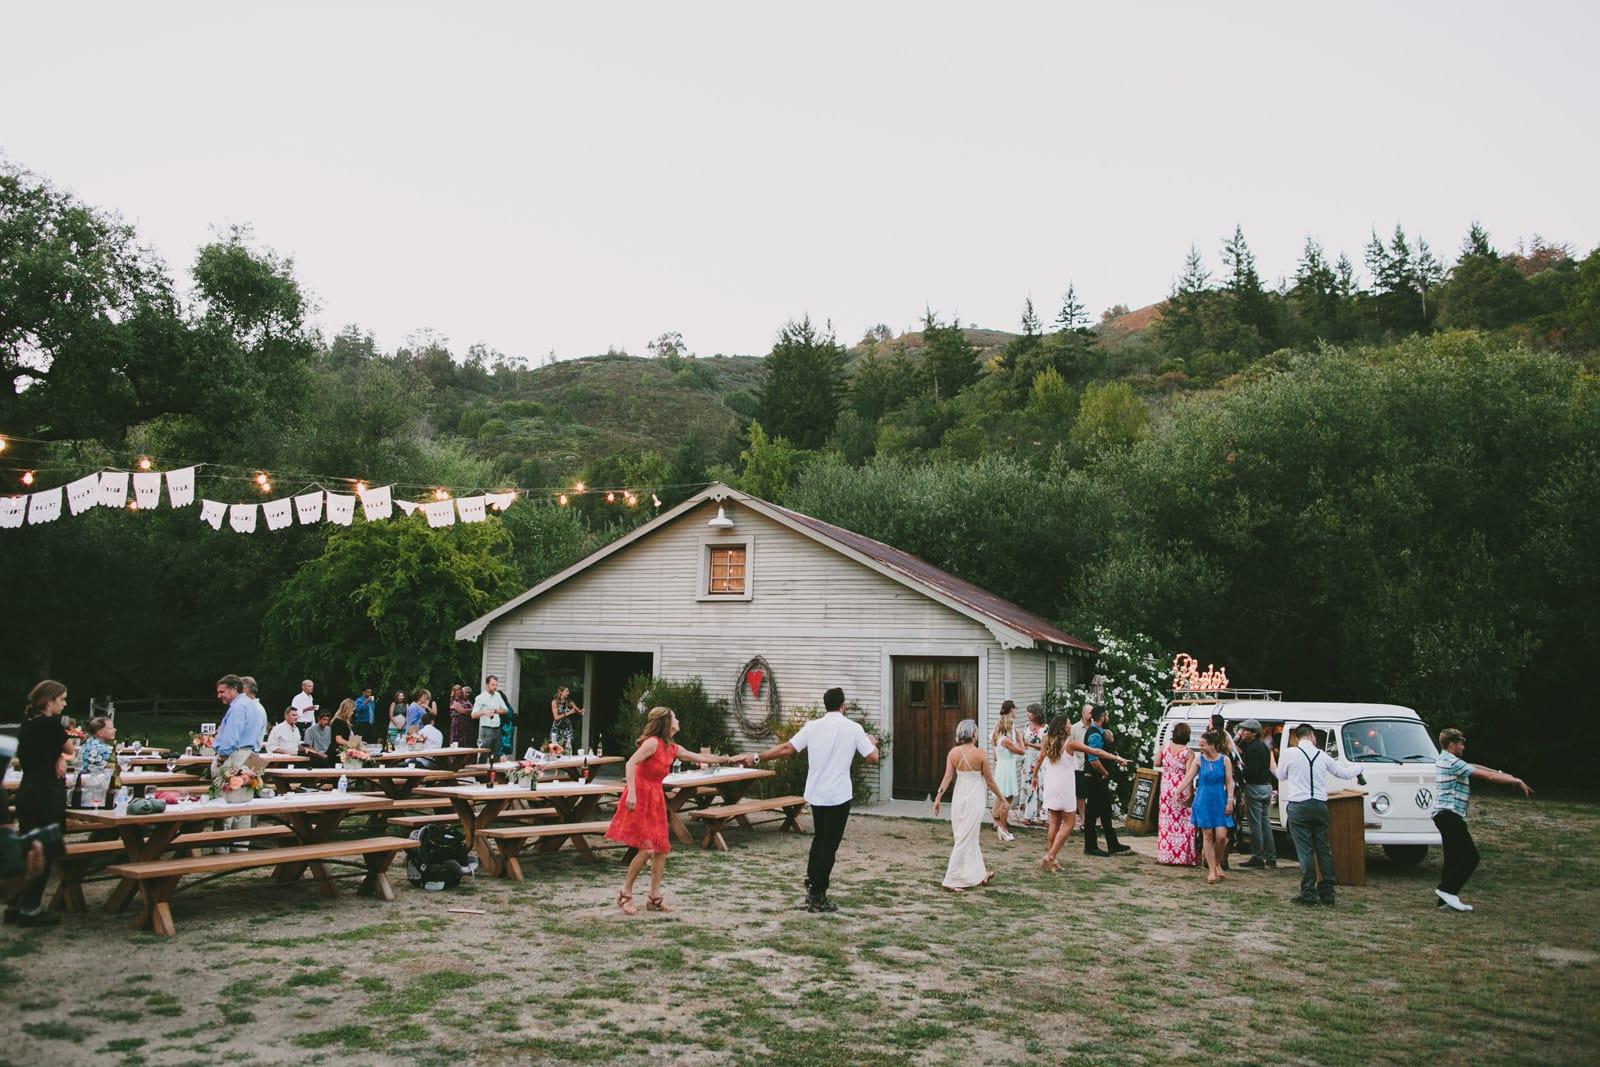 radonich_ranch_wedding_los_gatos_wedding_068